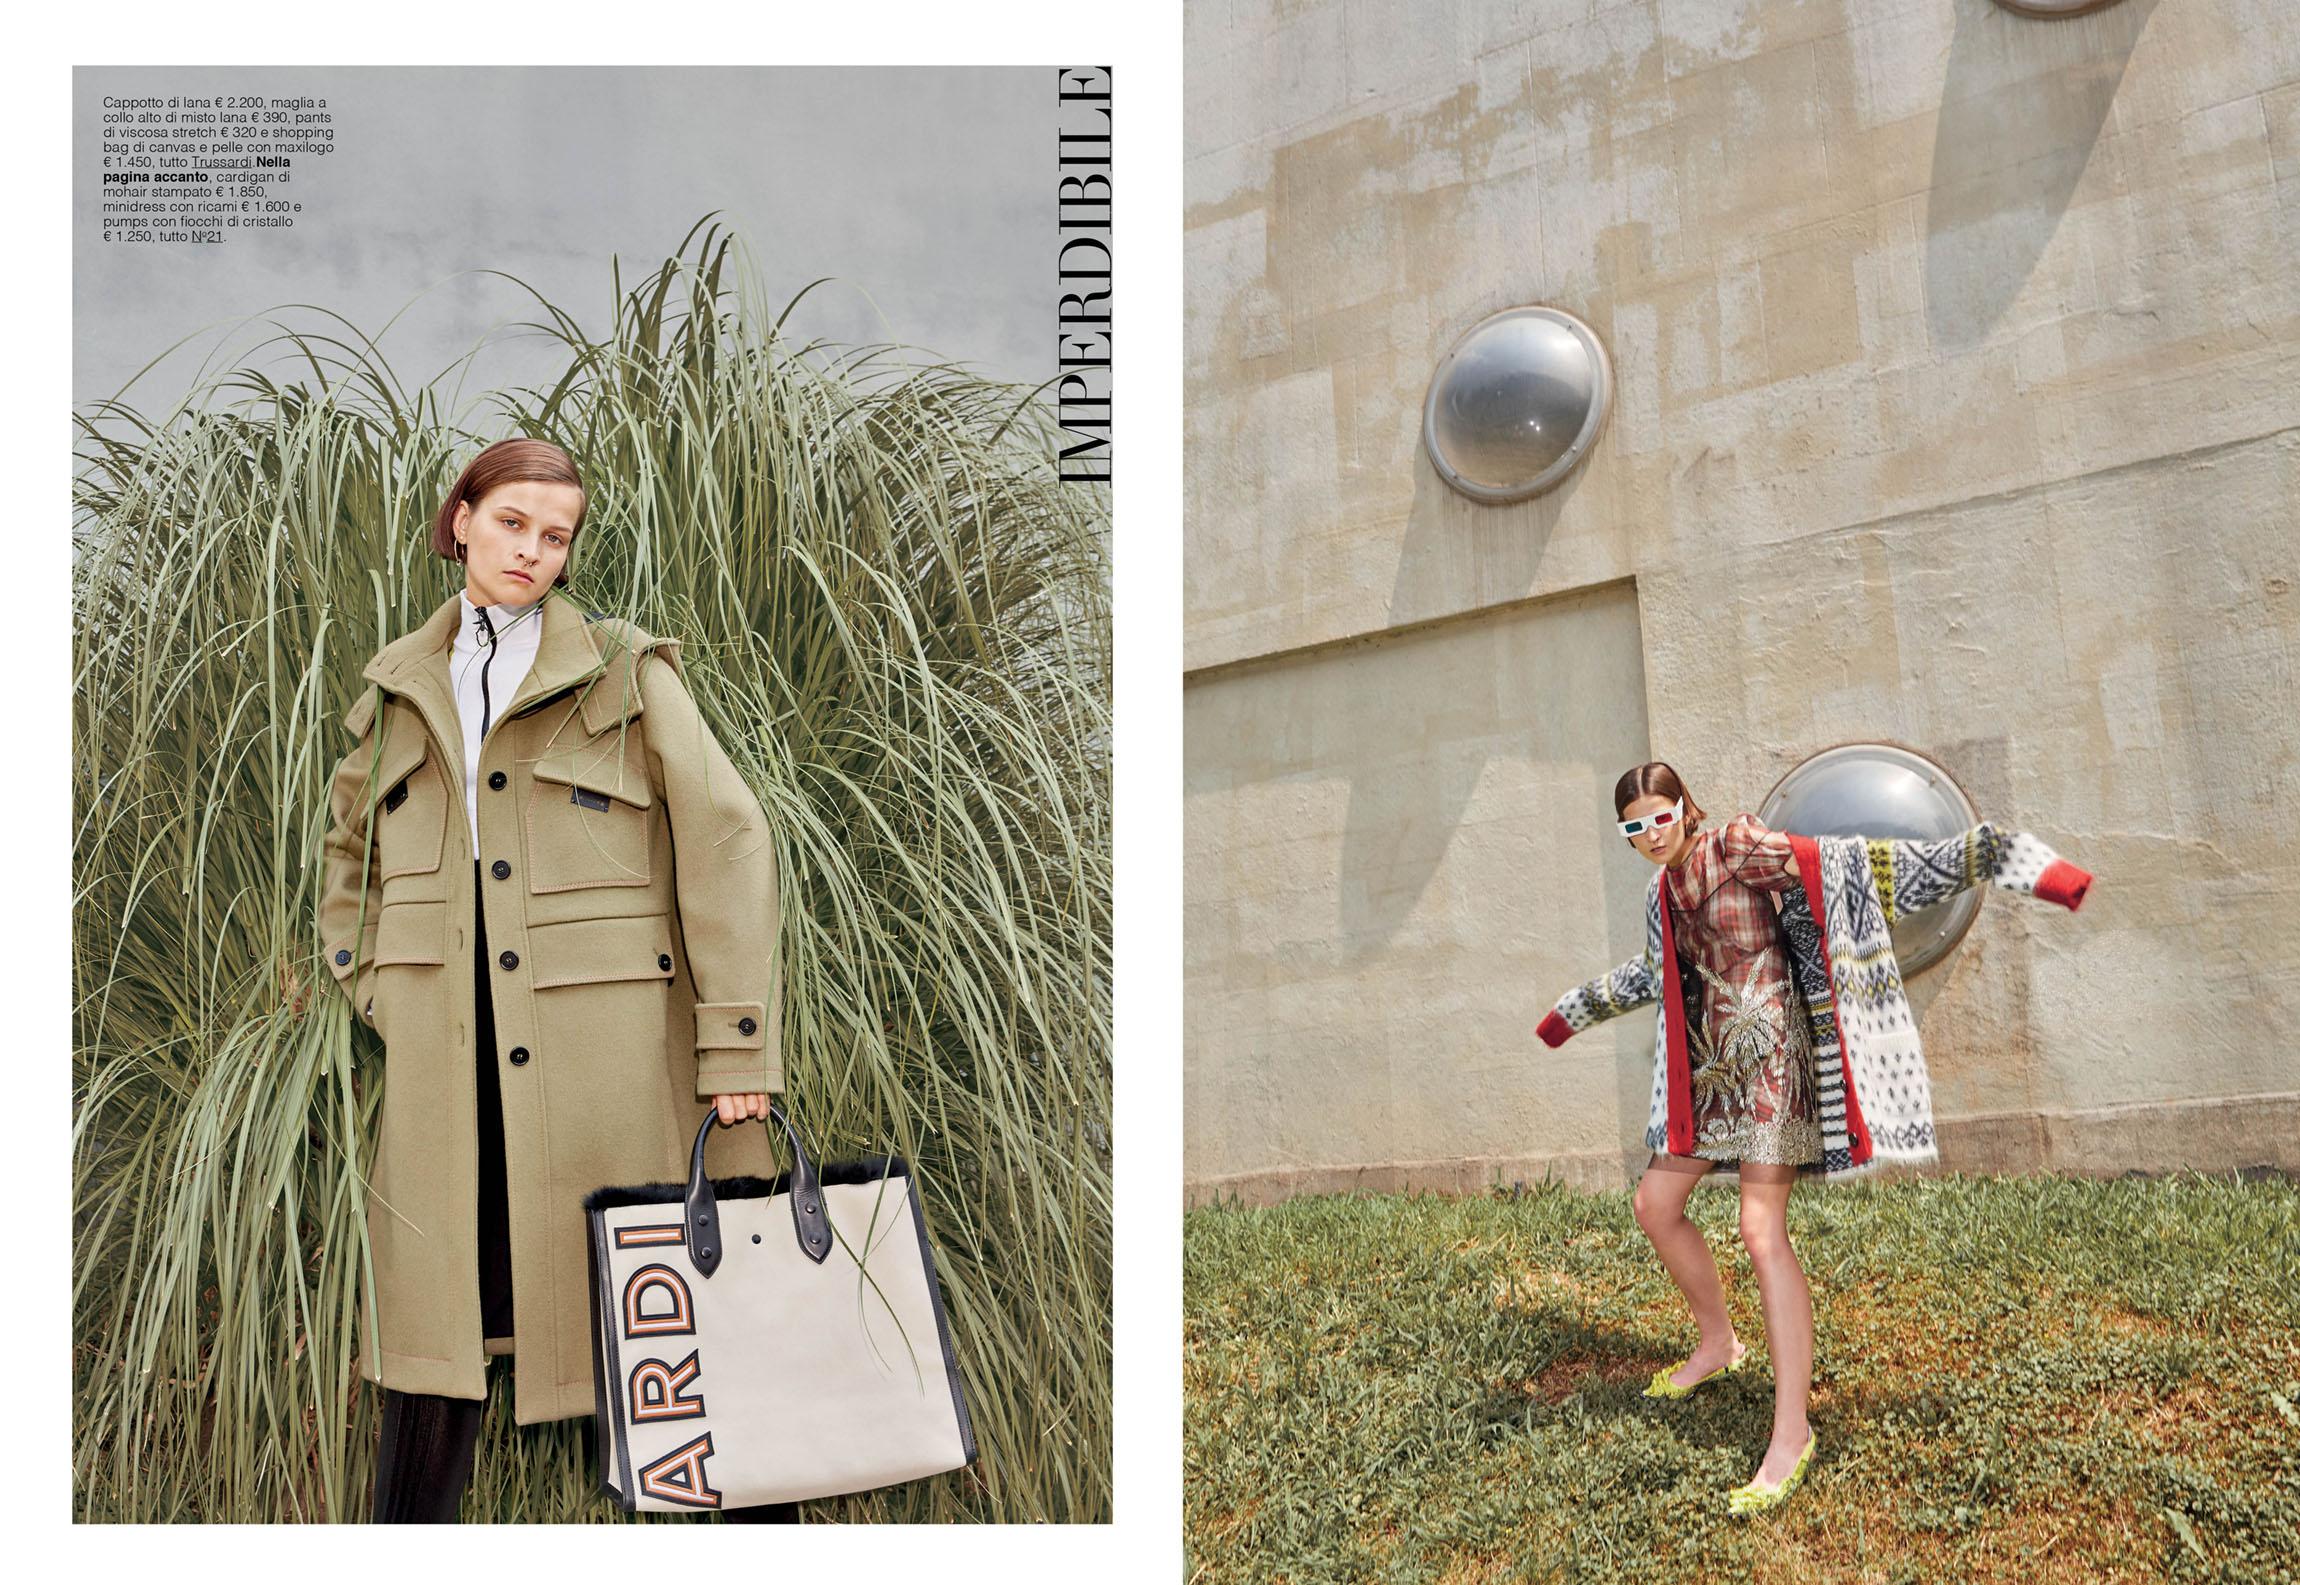 Gioia magazine August 2018 | Domingo Nardulli | Gioia | Maria Giulia Riva | Numerique Retouch Photo Retouching Studio